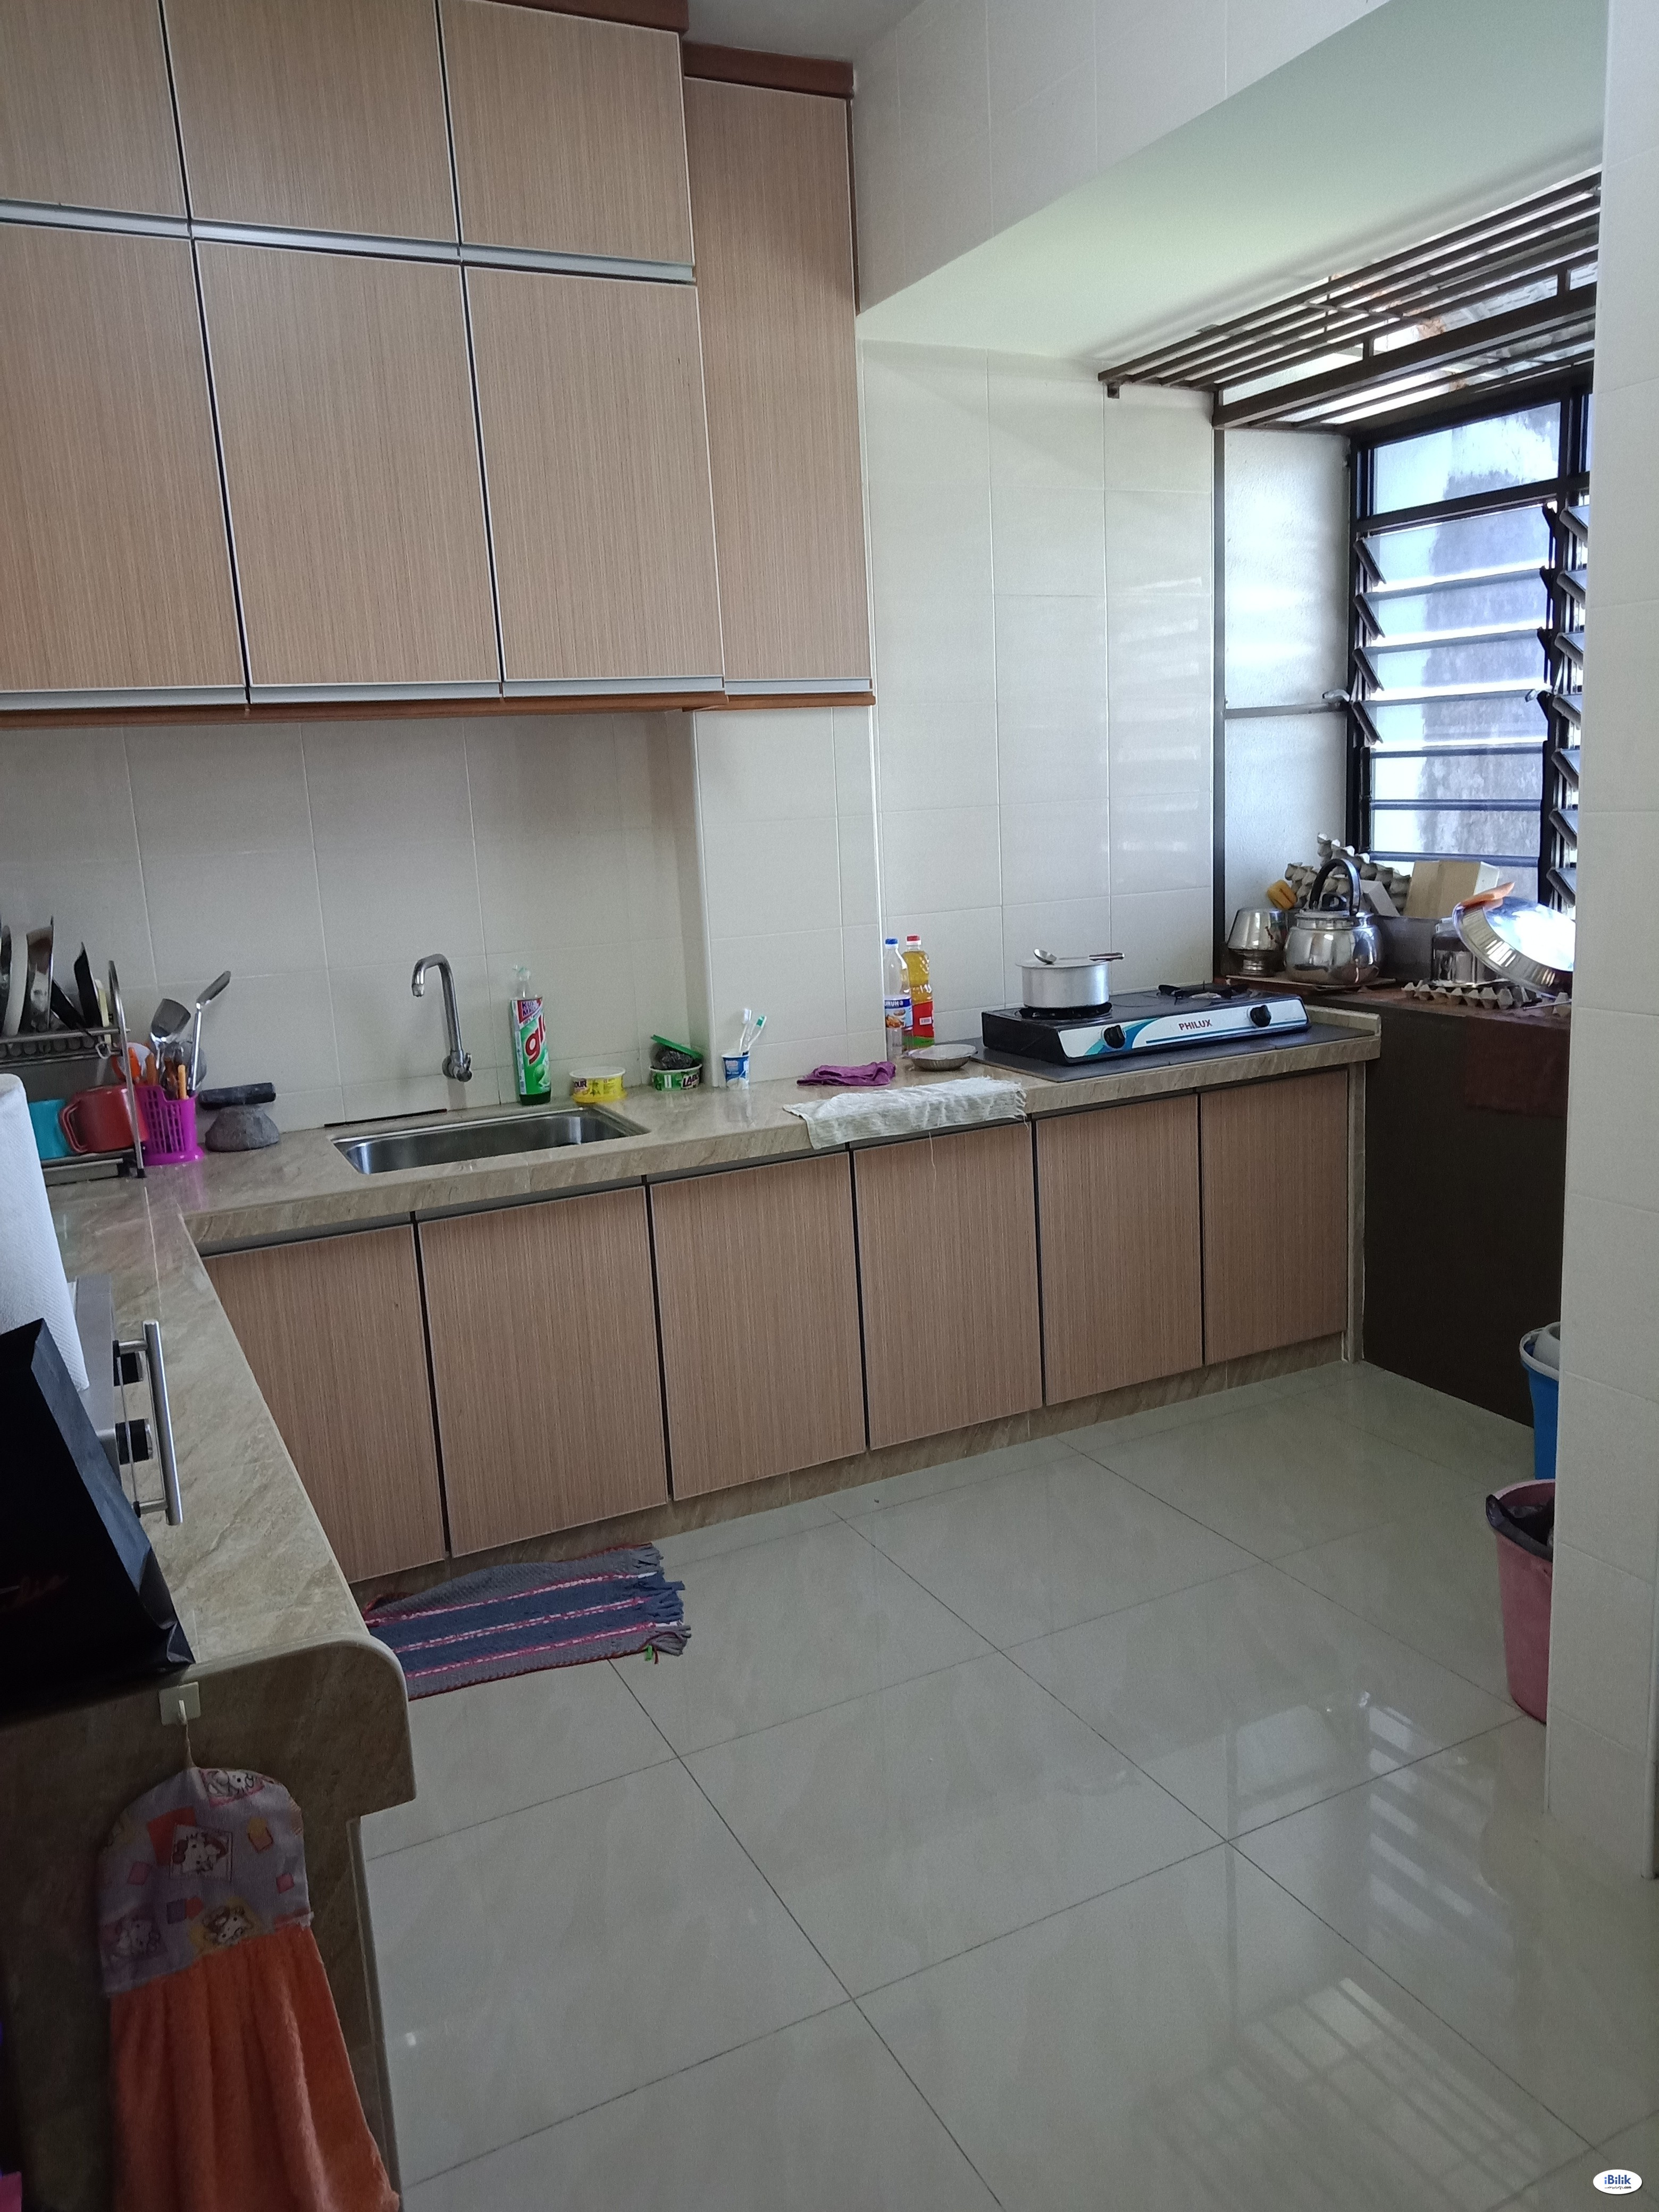 Middle Room at Medan Ria, Georgetown